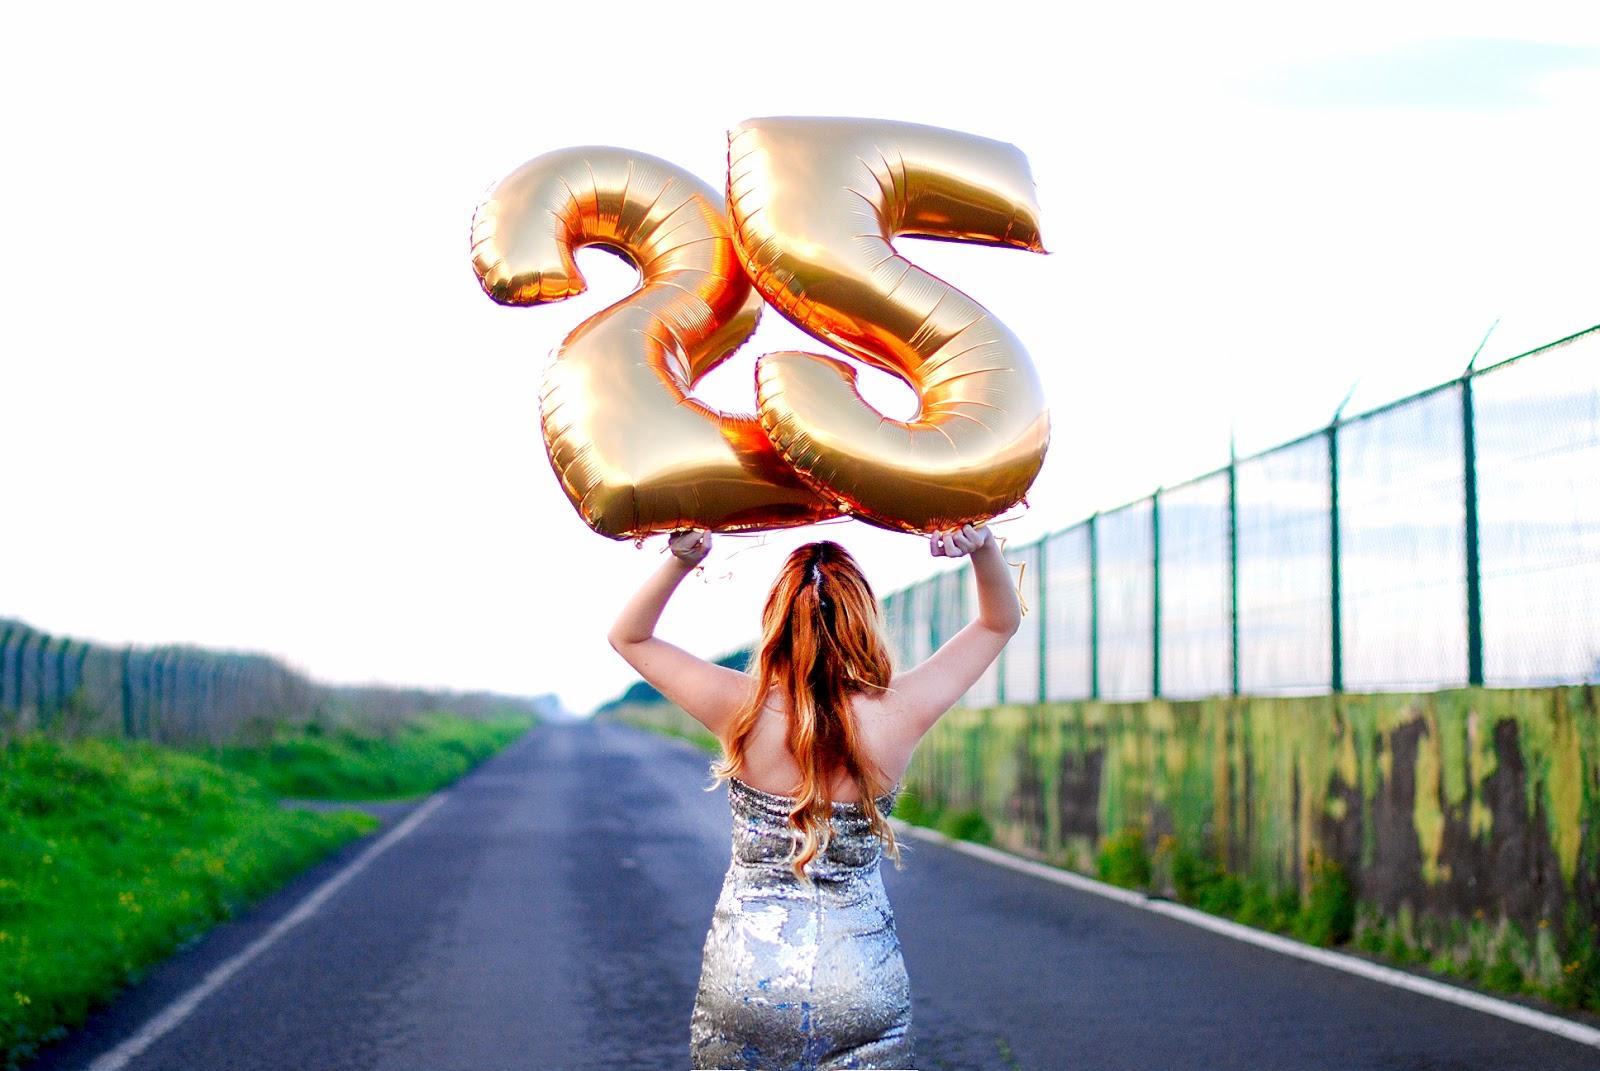 nery hdez, birthday look, look de cumpleaños, ax paris, sequins, lentejuelas, paillettes